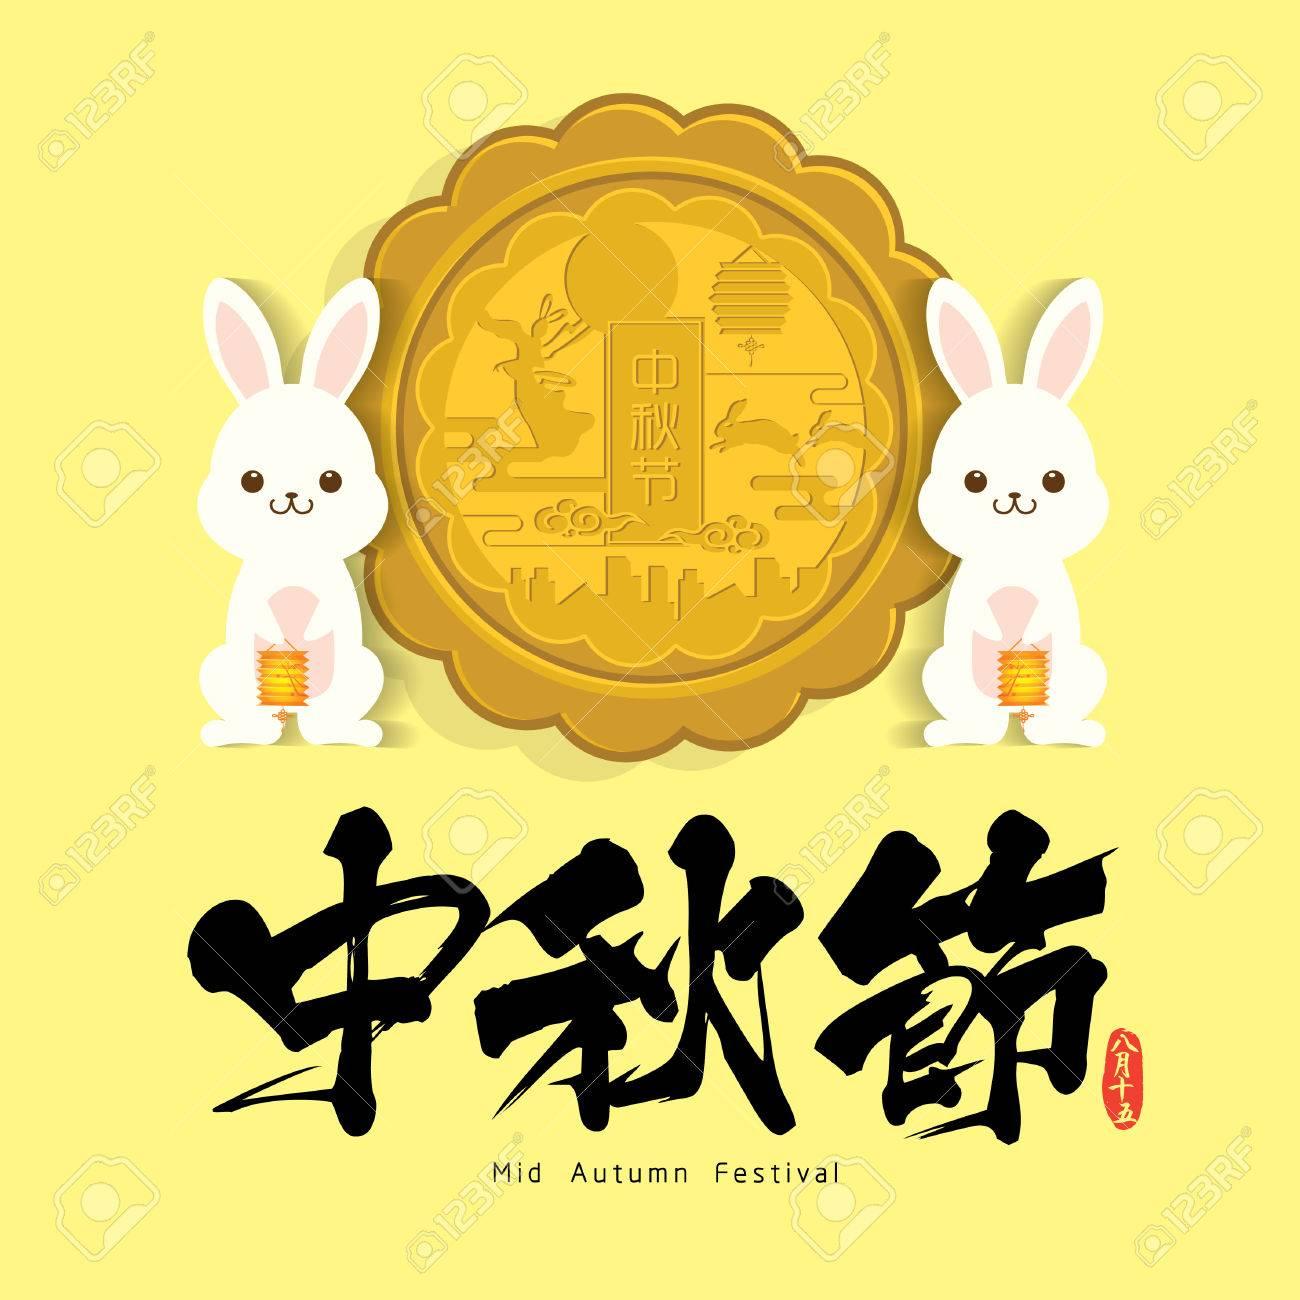 Mid-autumn festival illustration of cute bunnyand moon cake. Caption: Mid-autumn festival, 15th august - 84221291